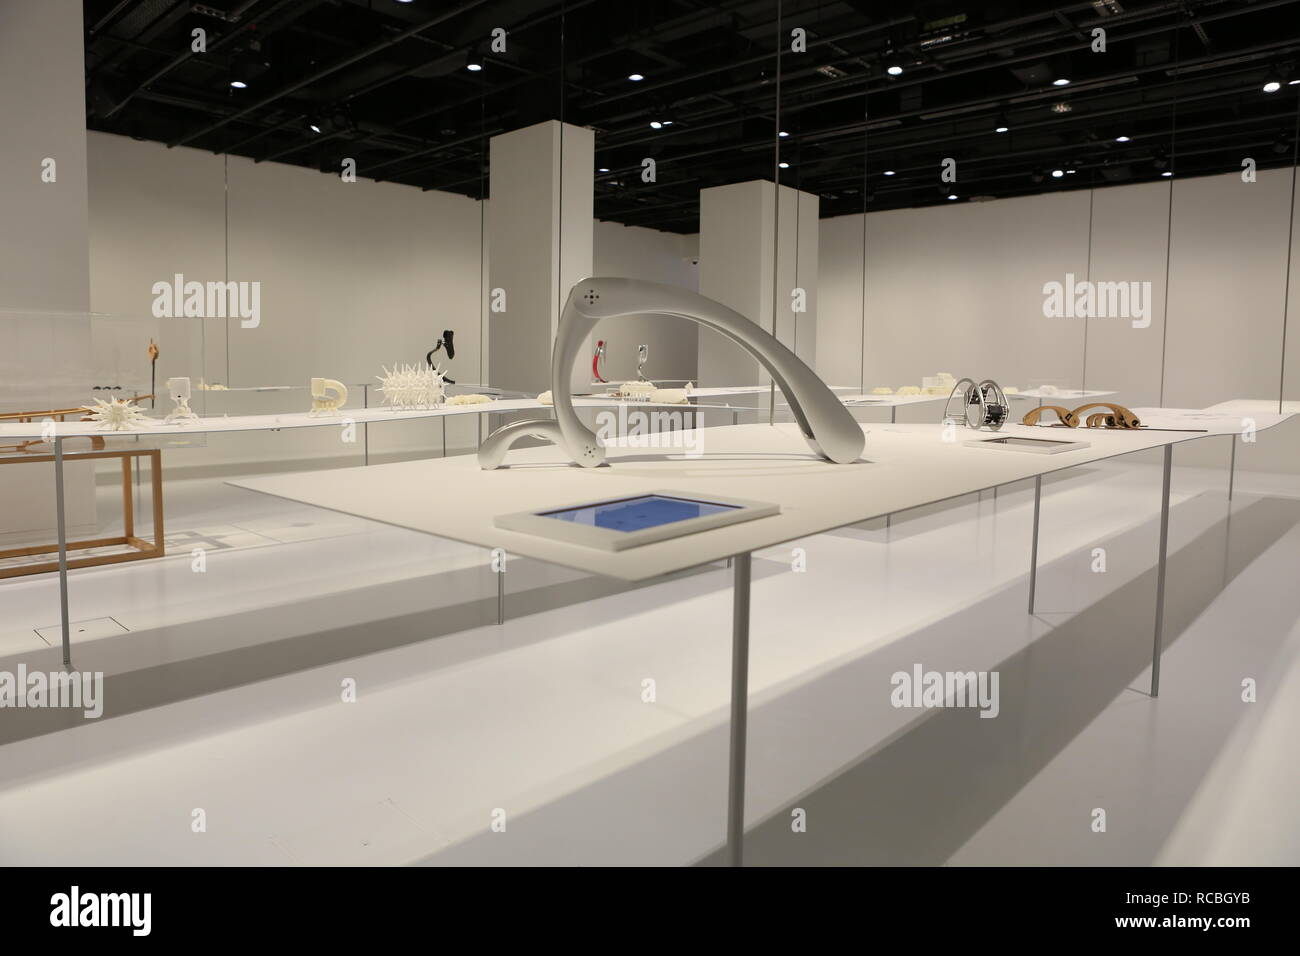 D Printing Exhibition Tokyo : Kensington london uk th jan images of prosthetics taken